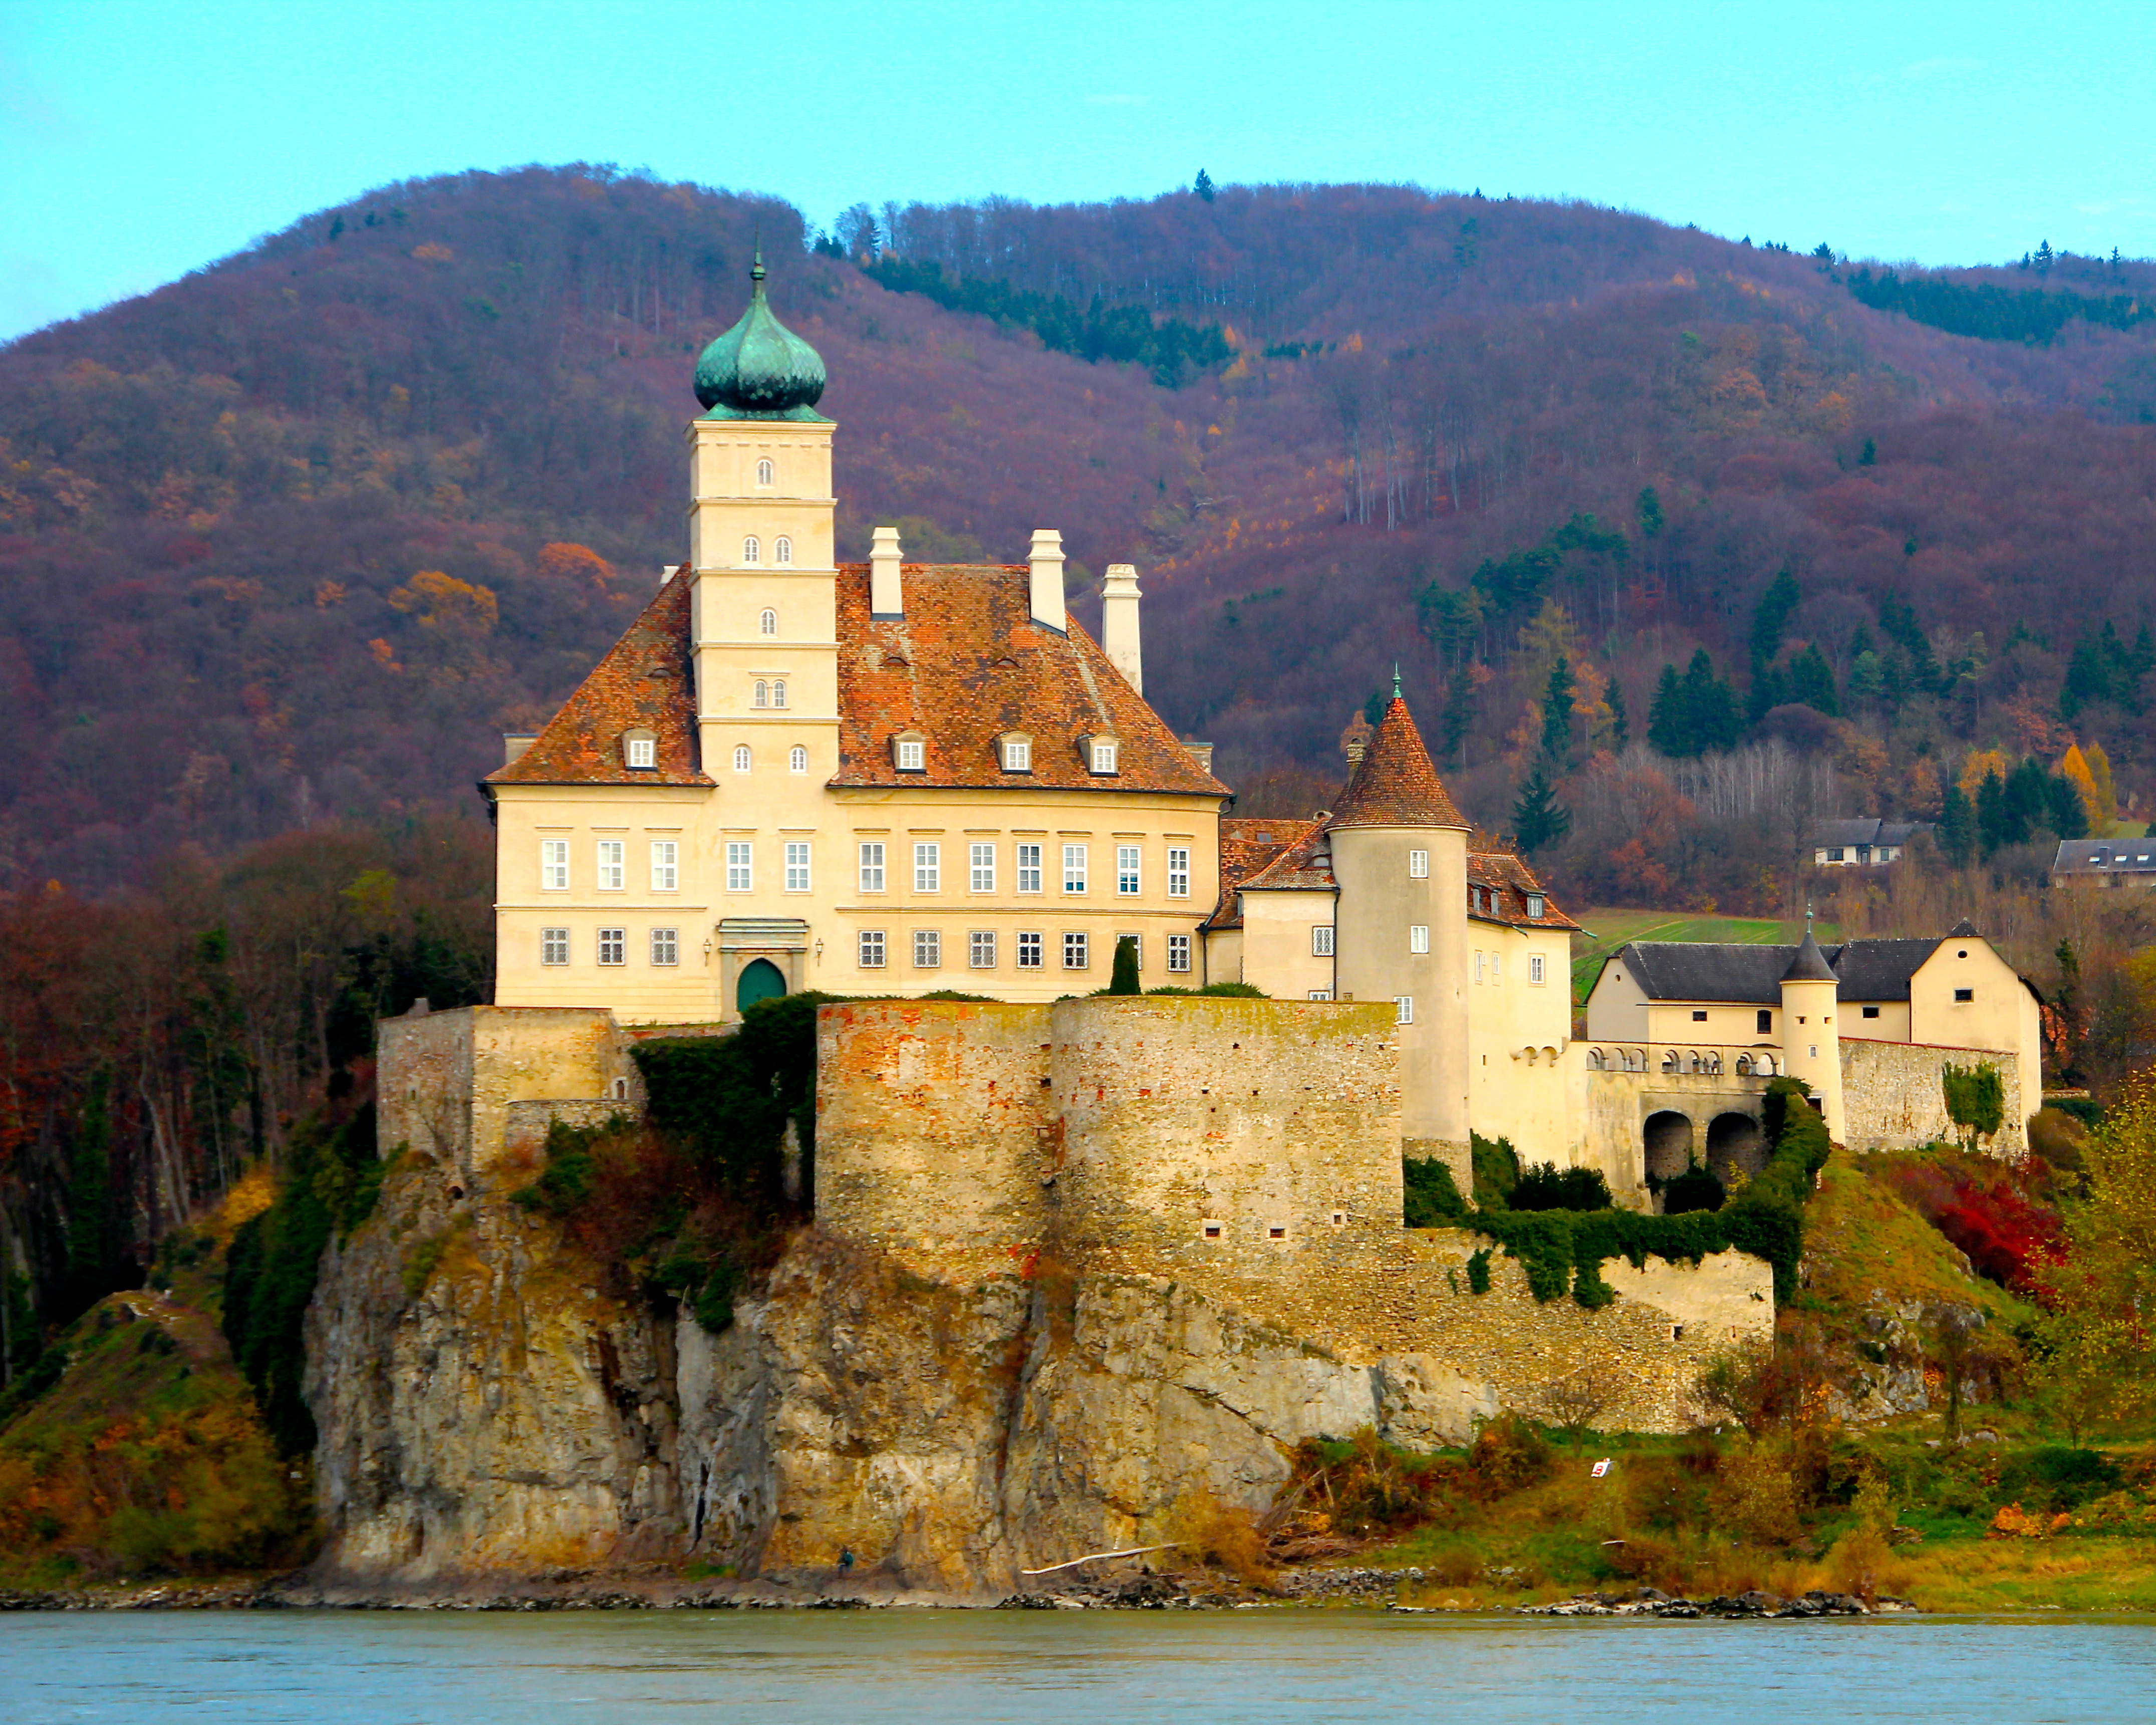 Loving Our Children And Grandchildren Northern European Cruise Danube River Cruise Tractor